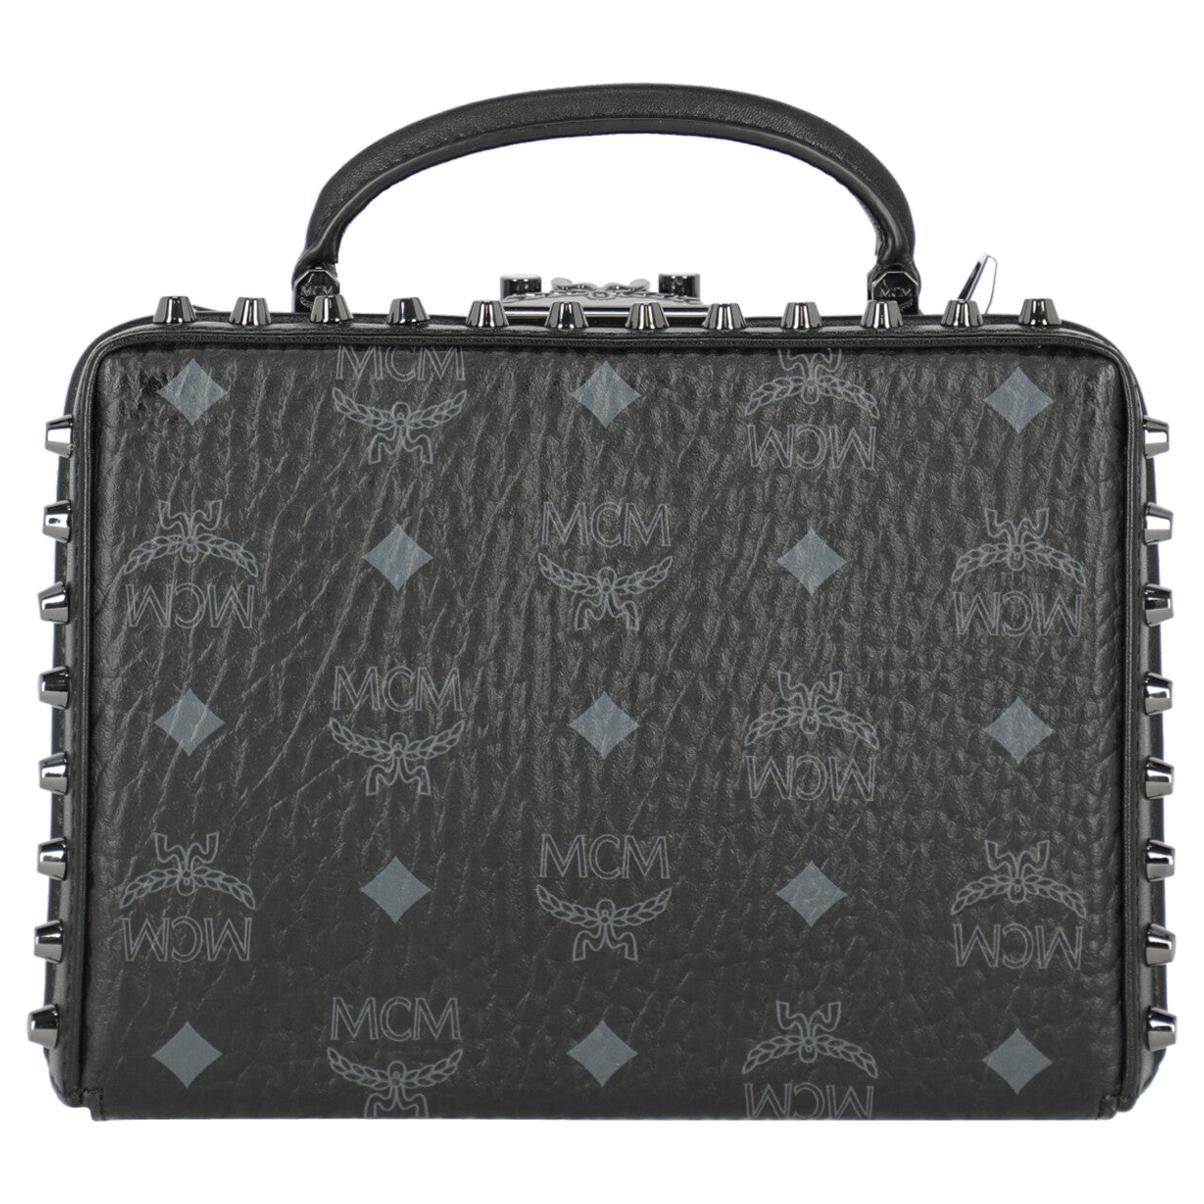 Mcm Woman Handbag Black